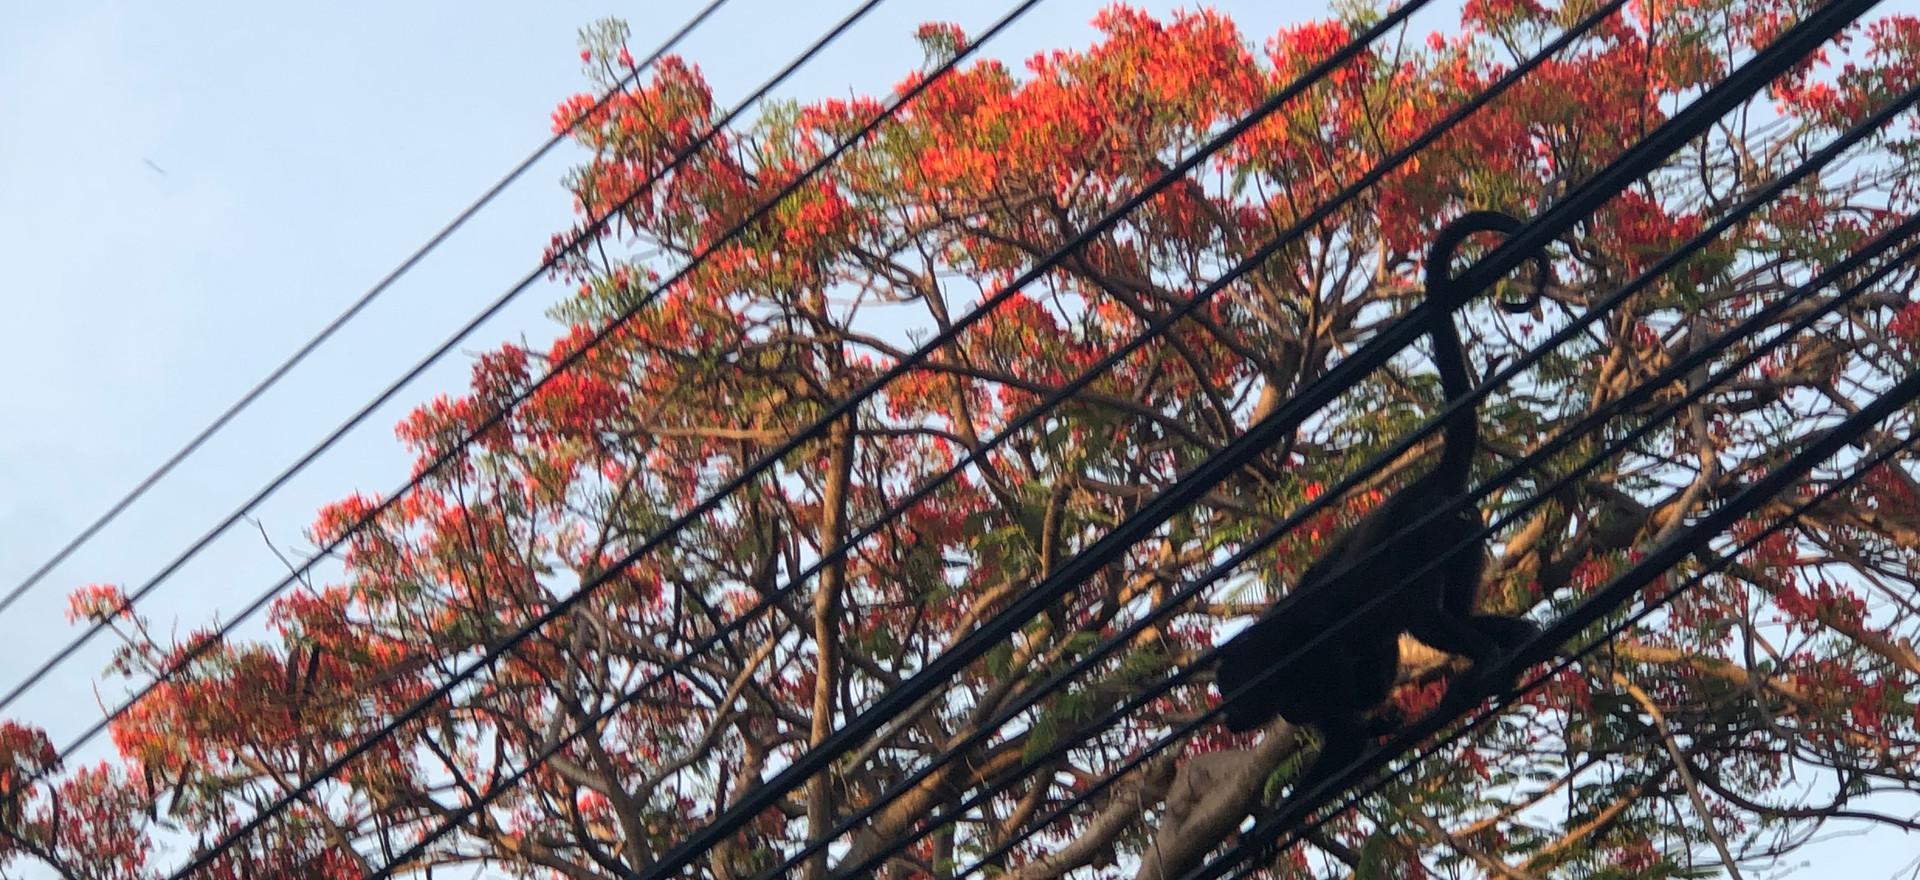 Monikers and Birds in the Tropics